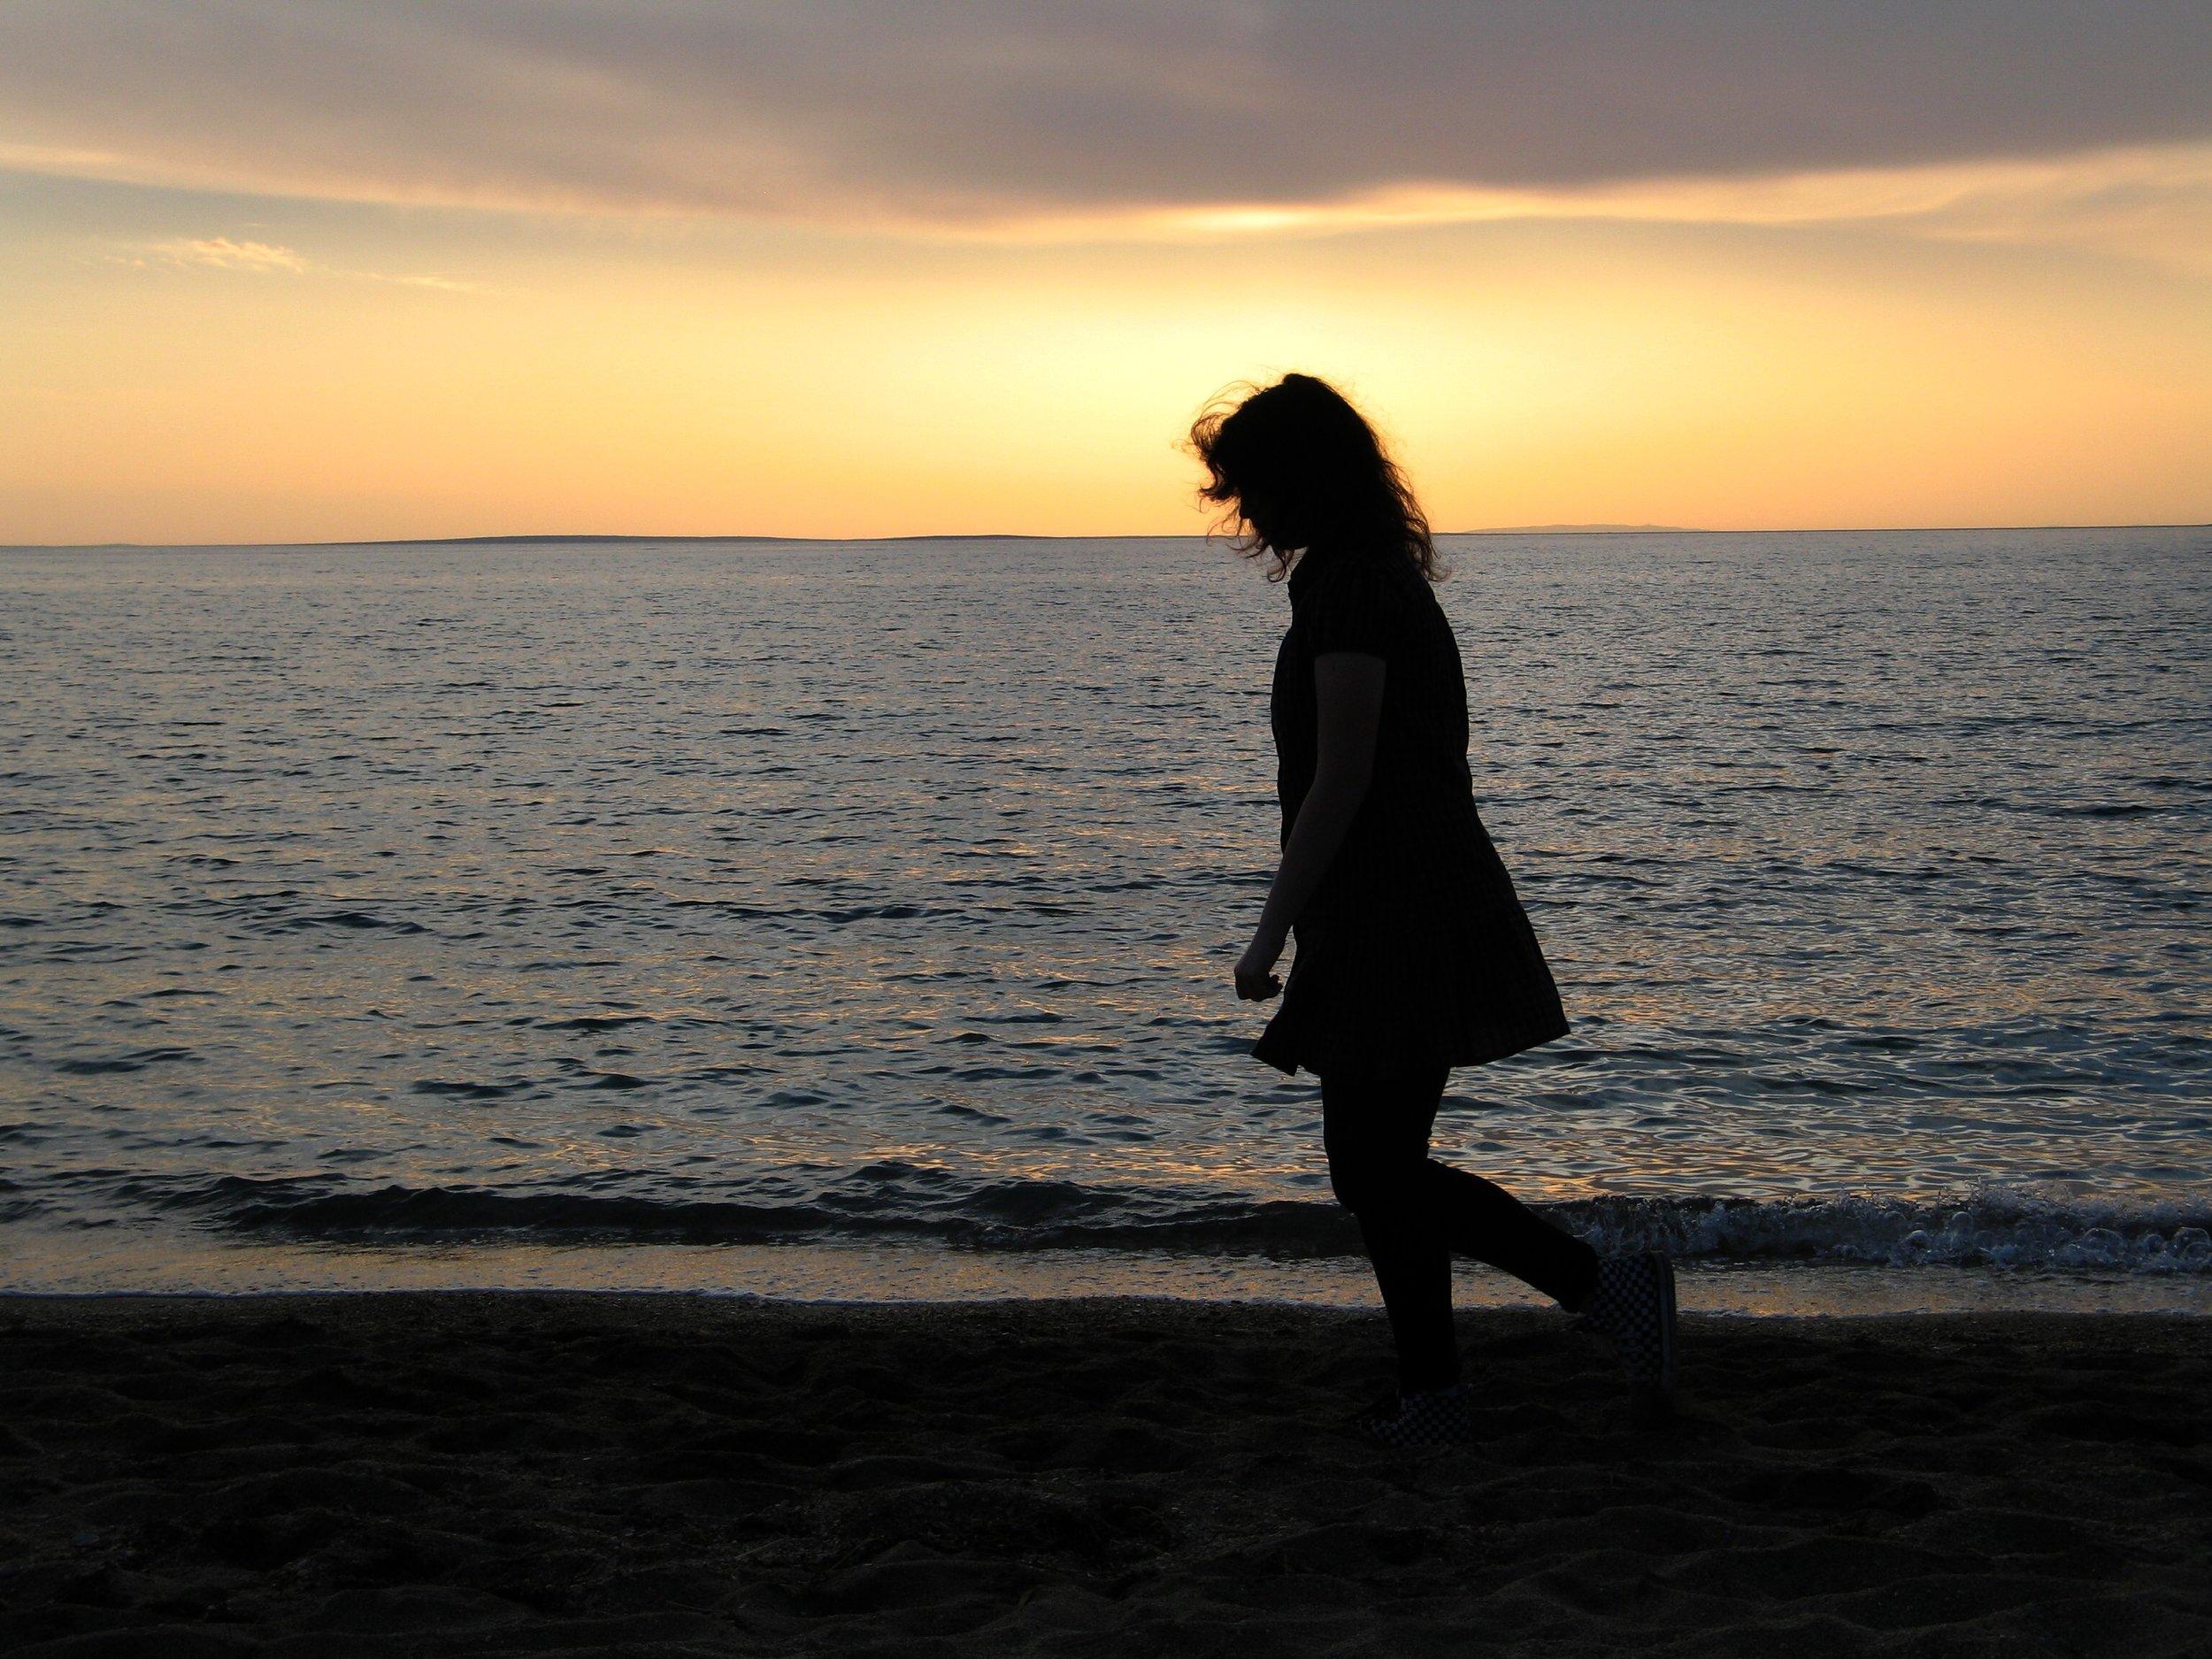 solitary-walk-on-beach.jpg